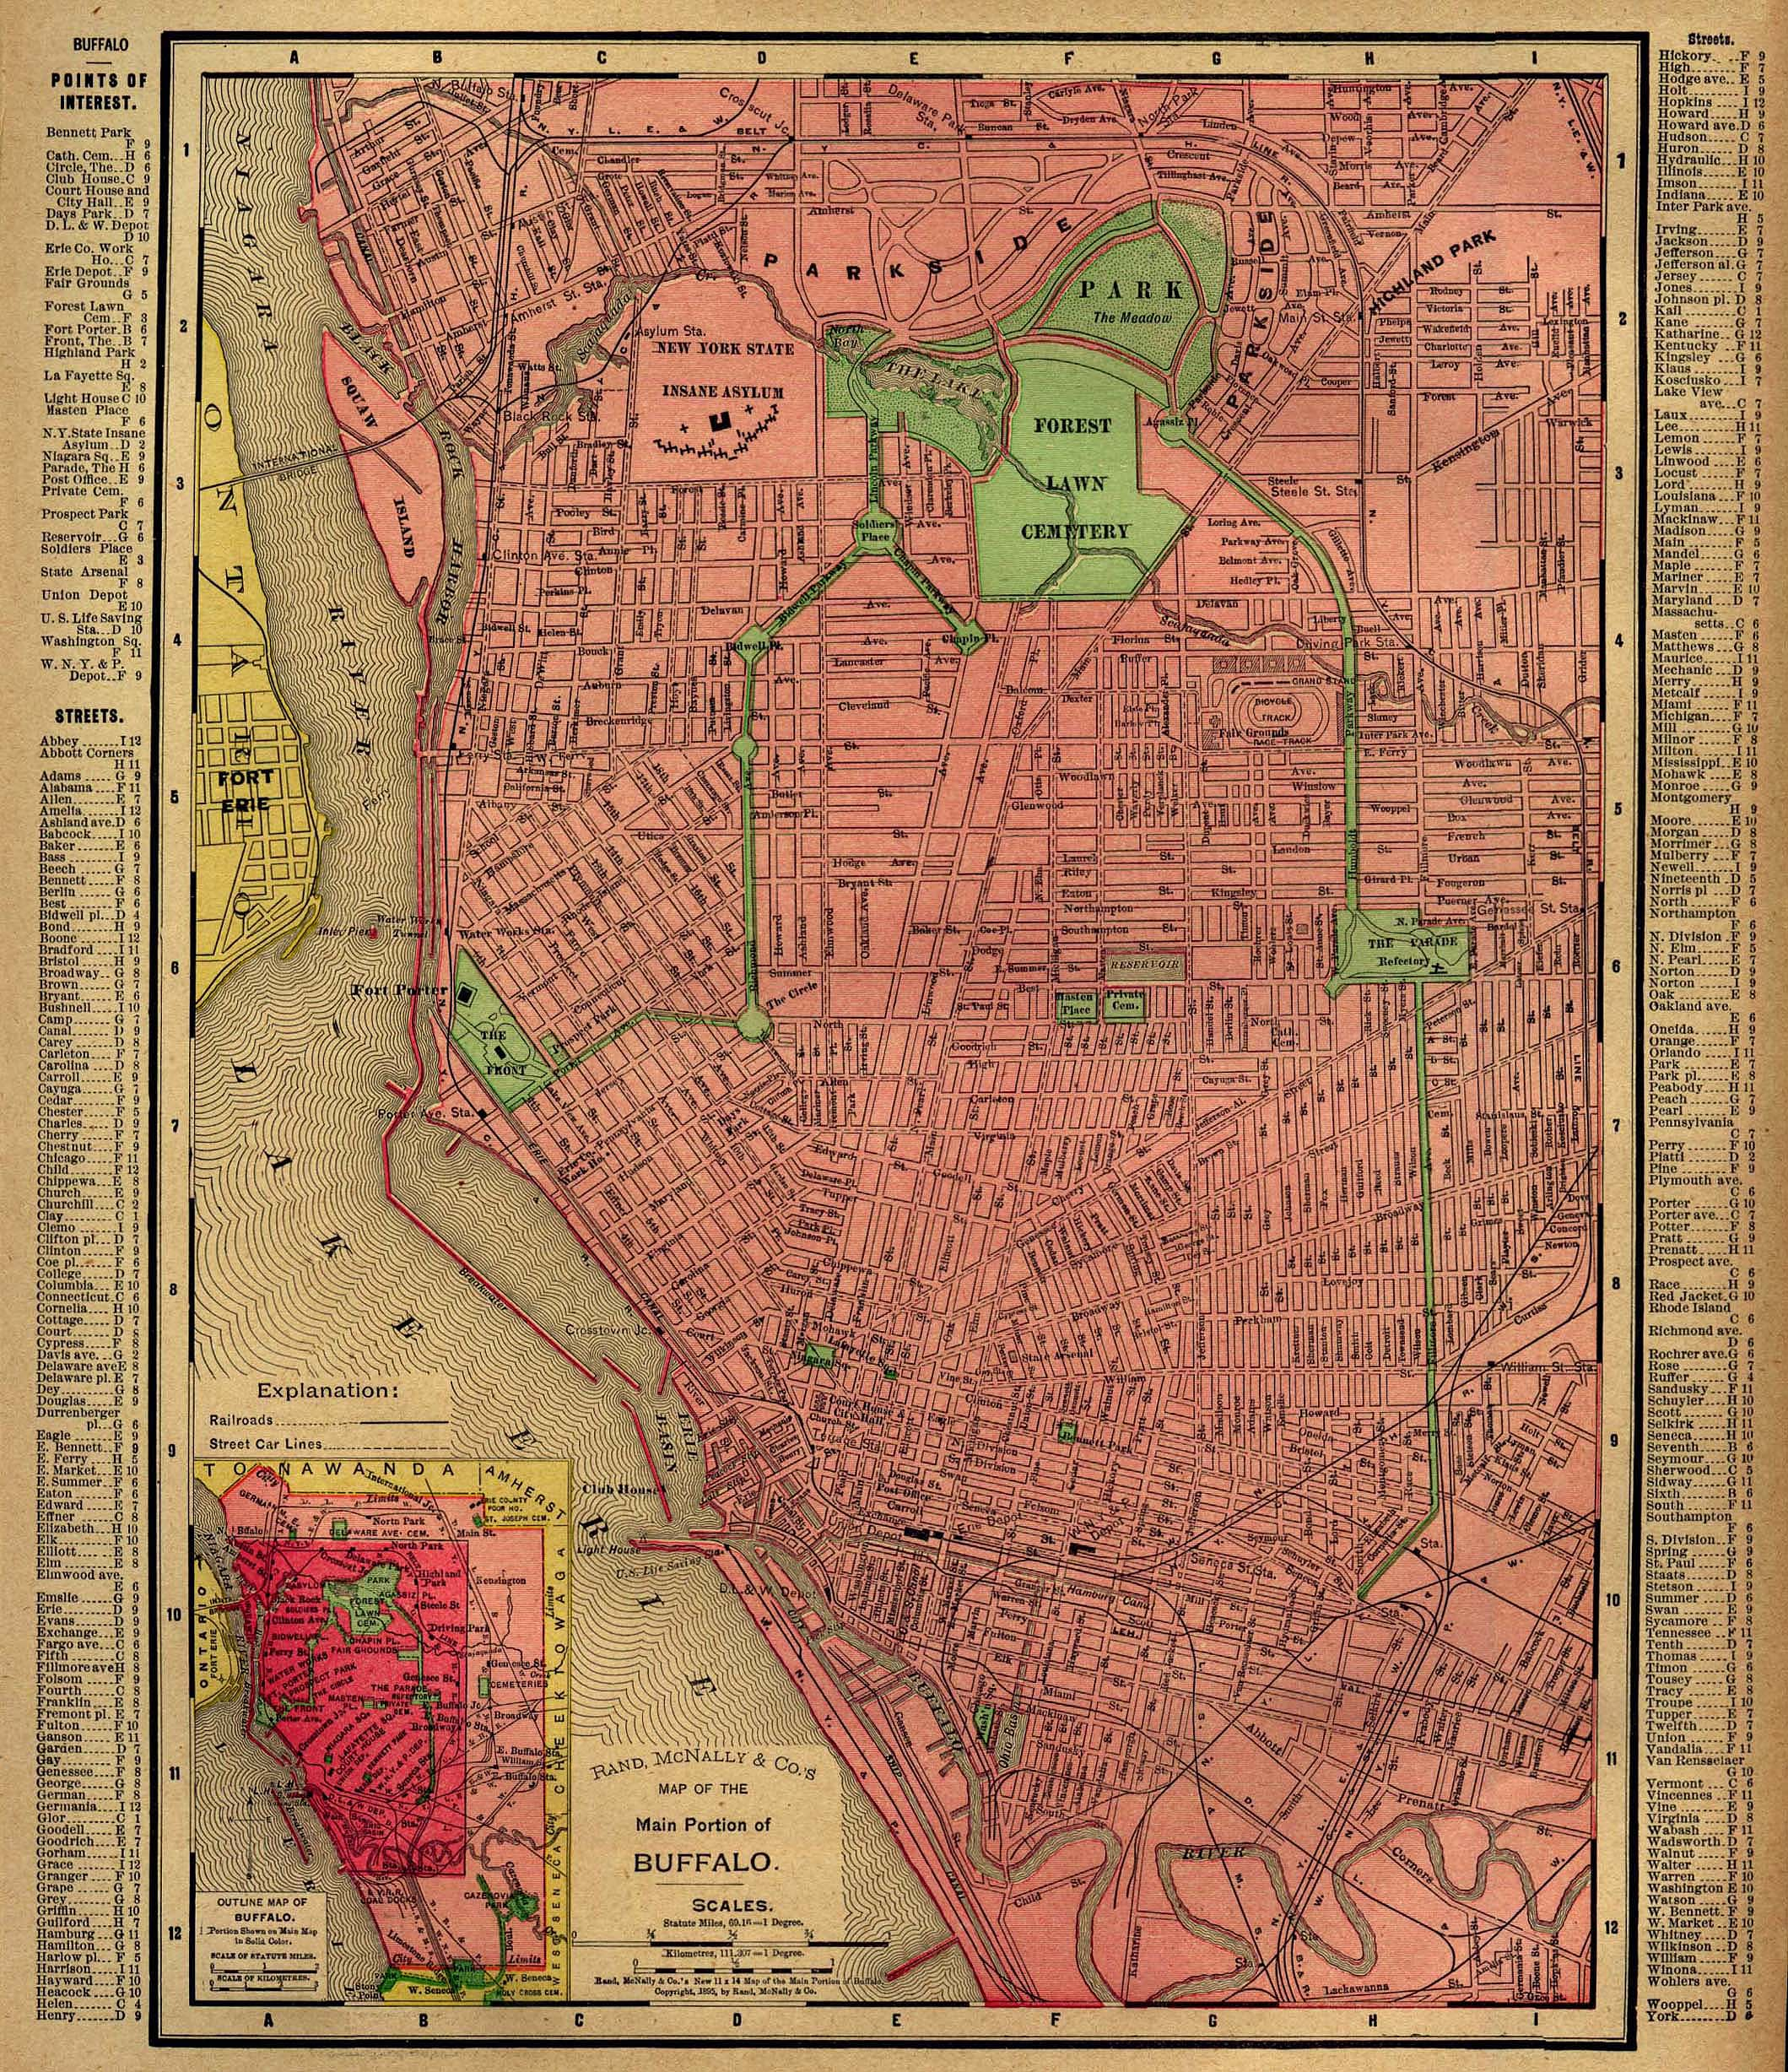 Mapa de Buffalo, Nueva York, Estados Unidos 1896